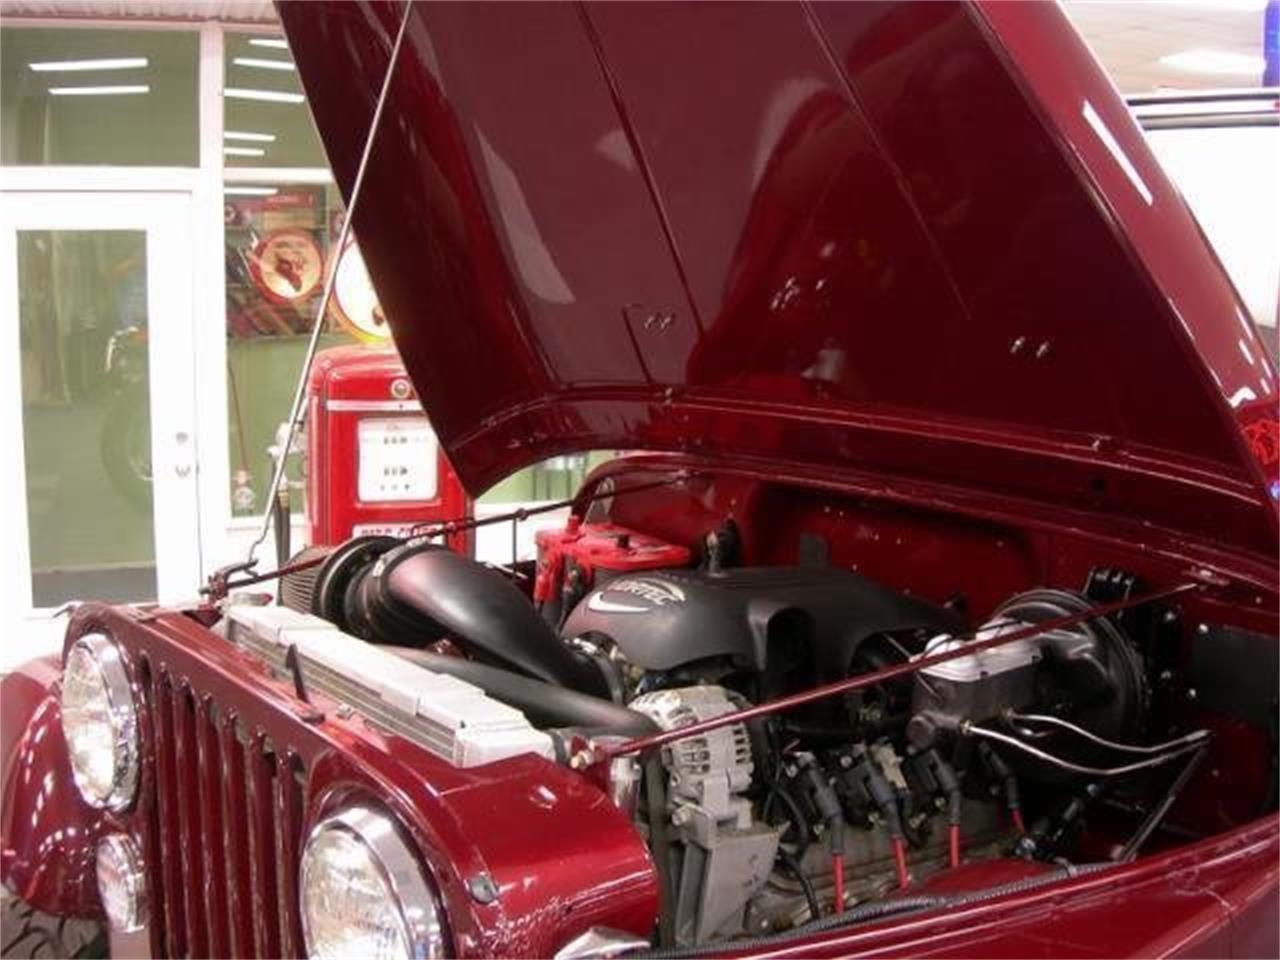 Used Cars Dothan Al >> 1984 Jeep Wrangler for sale in Dothan, AL / ClassicCarsBay.com